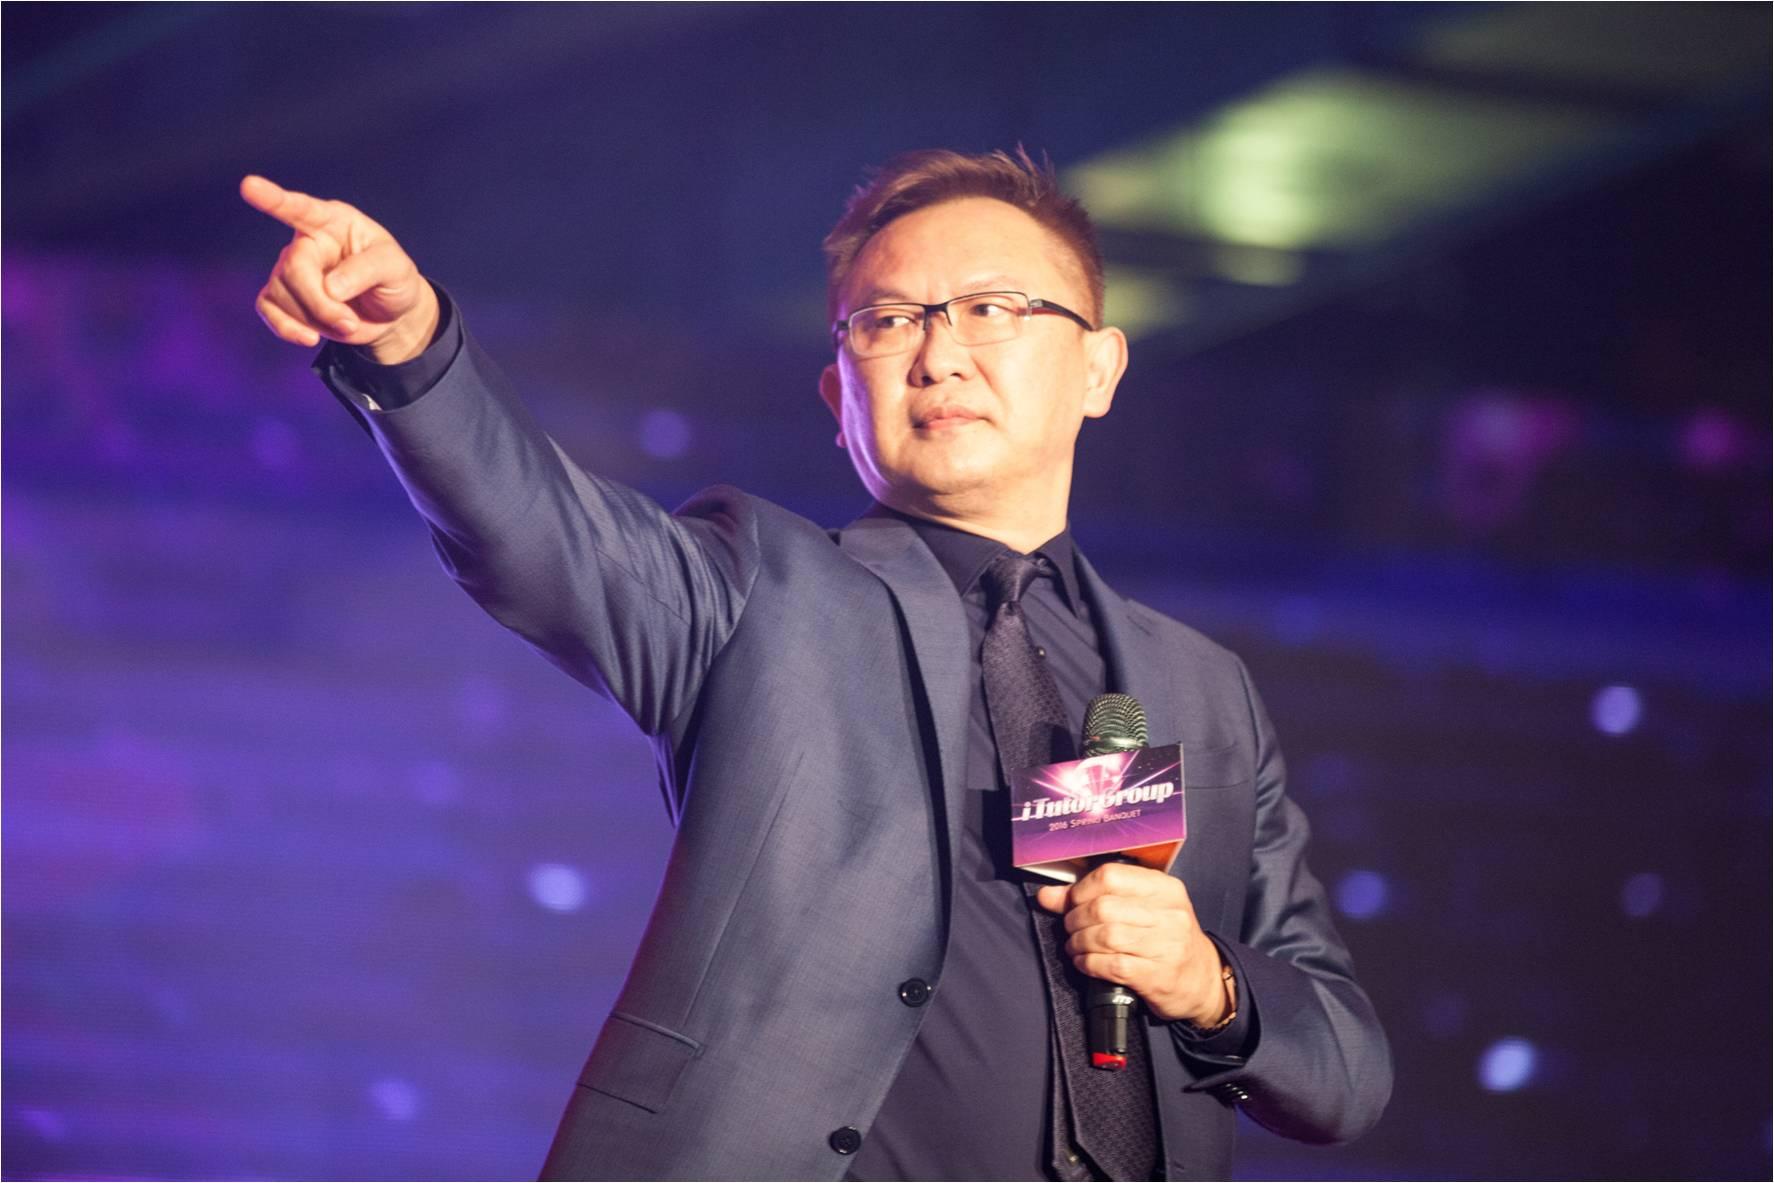 01.iTutorGroup集團創辦人楊明定位雇主品牌新形象-內部創業 在家工作及接班人計劃-1